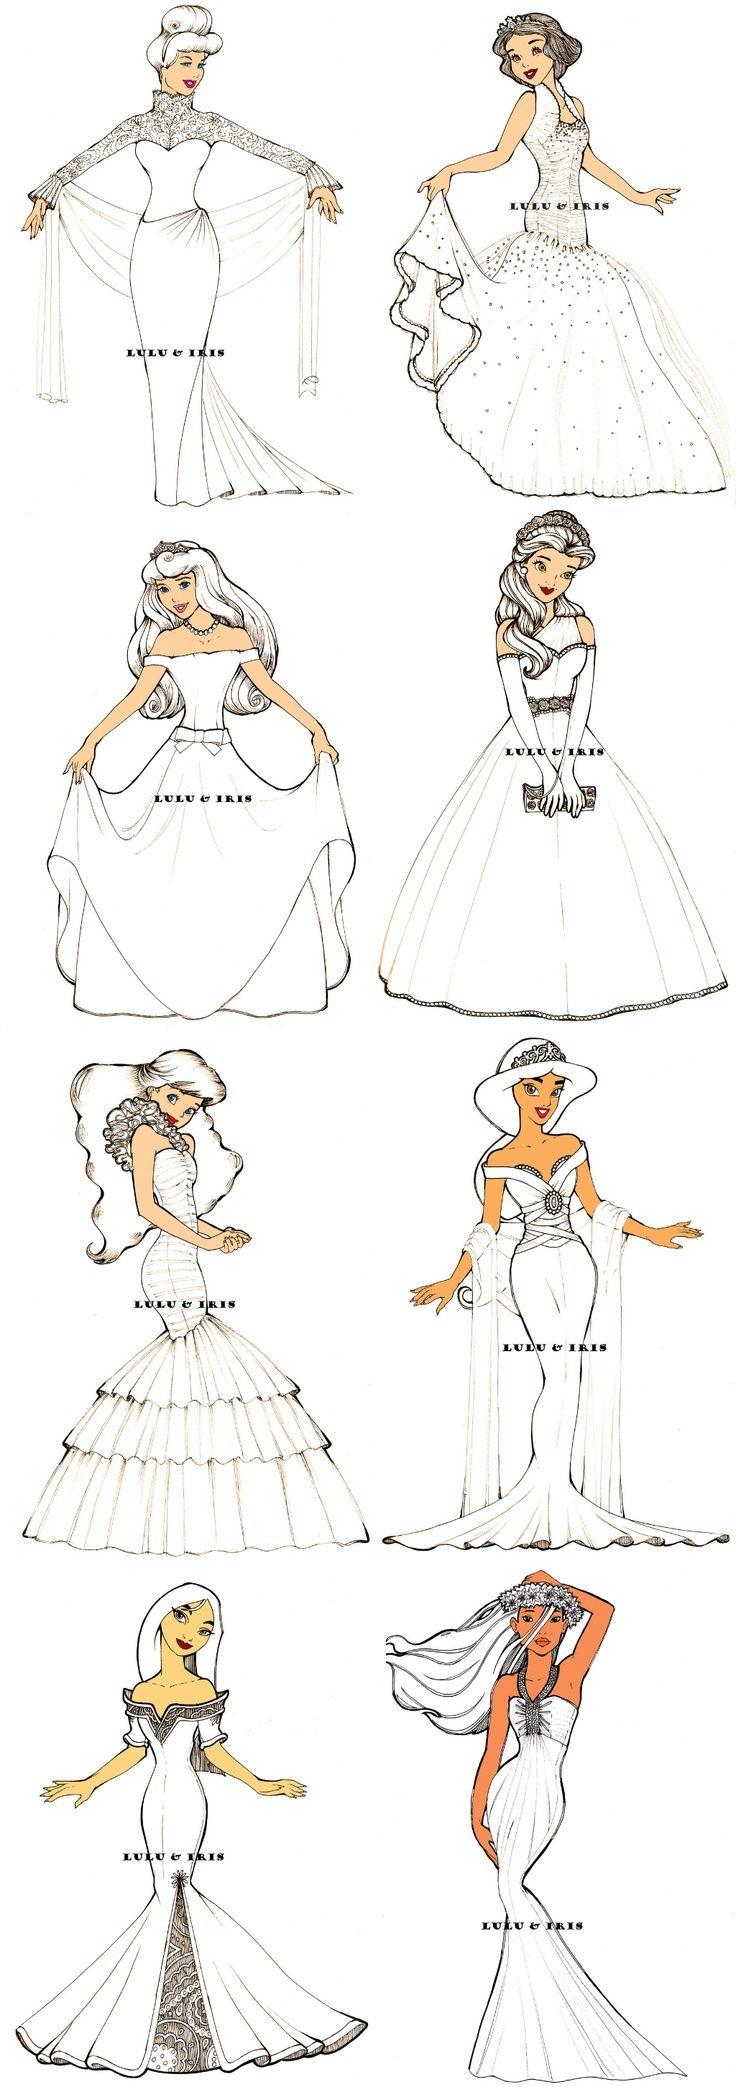 Disney princesses in wedding dresses